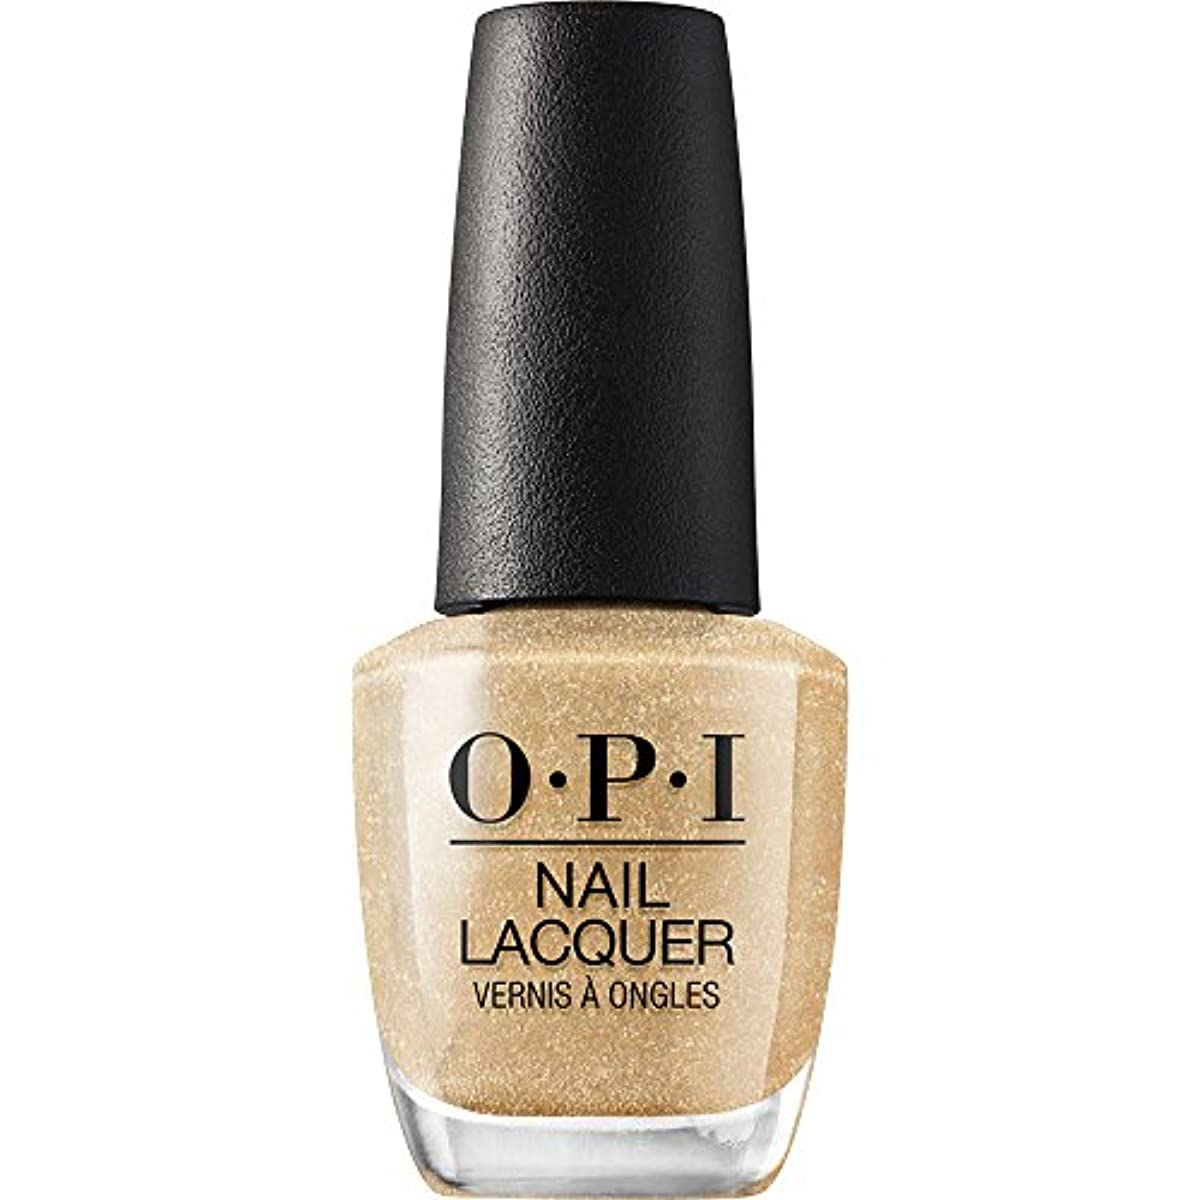 OPI(オーピーアイ) NLB33 アップ フロント&パーソナル